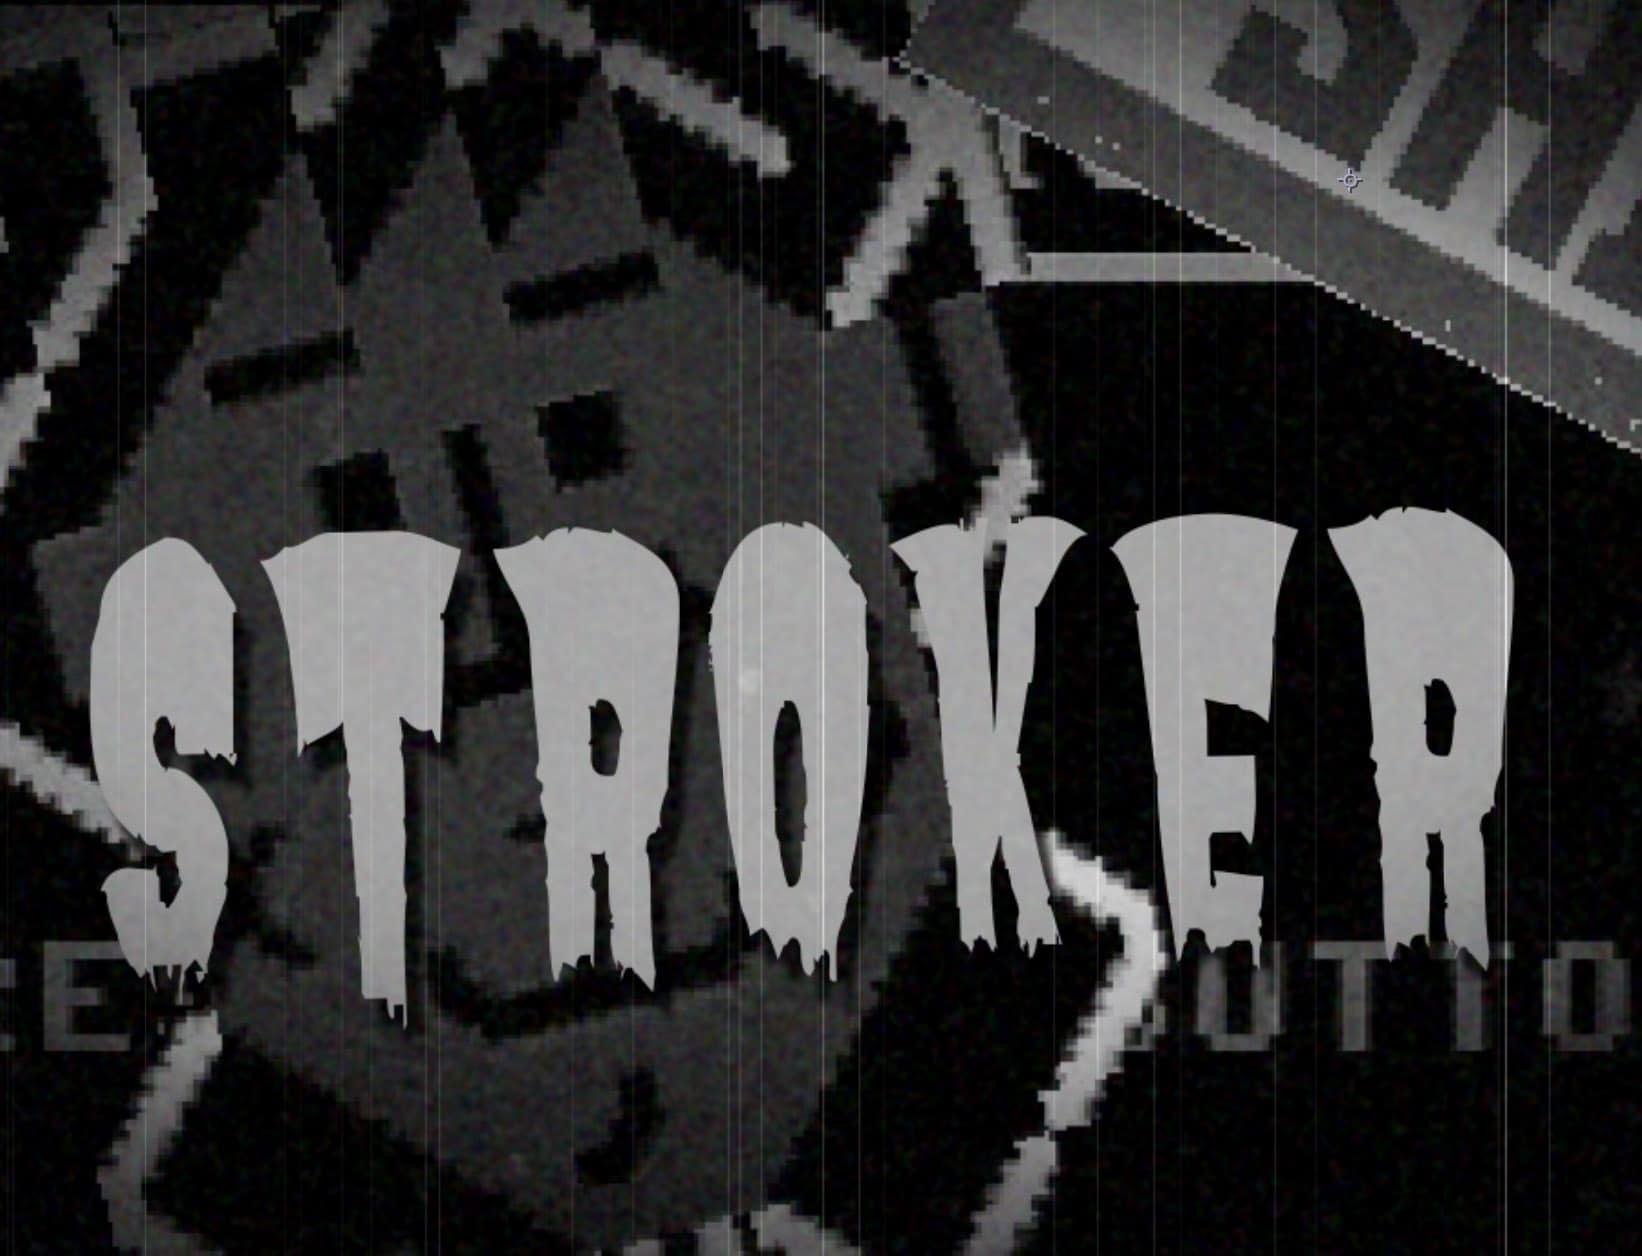 Stroker (C64, 1983)